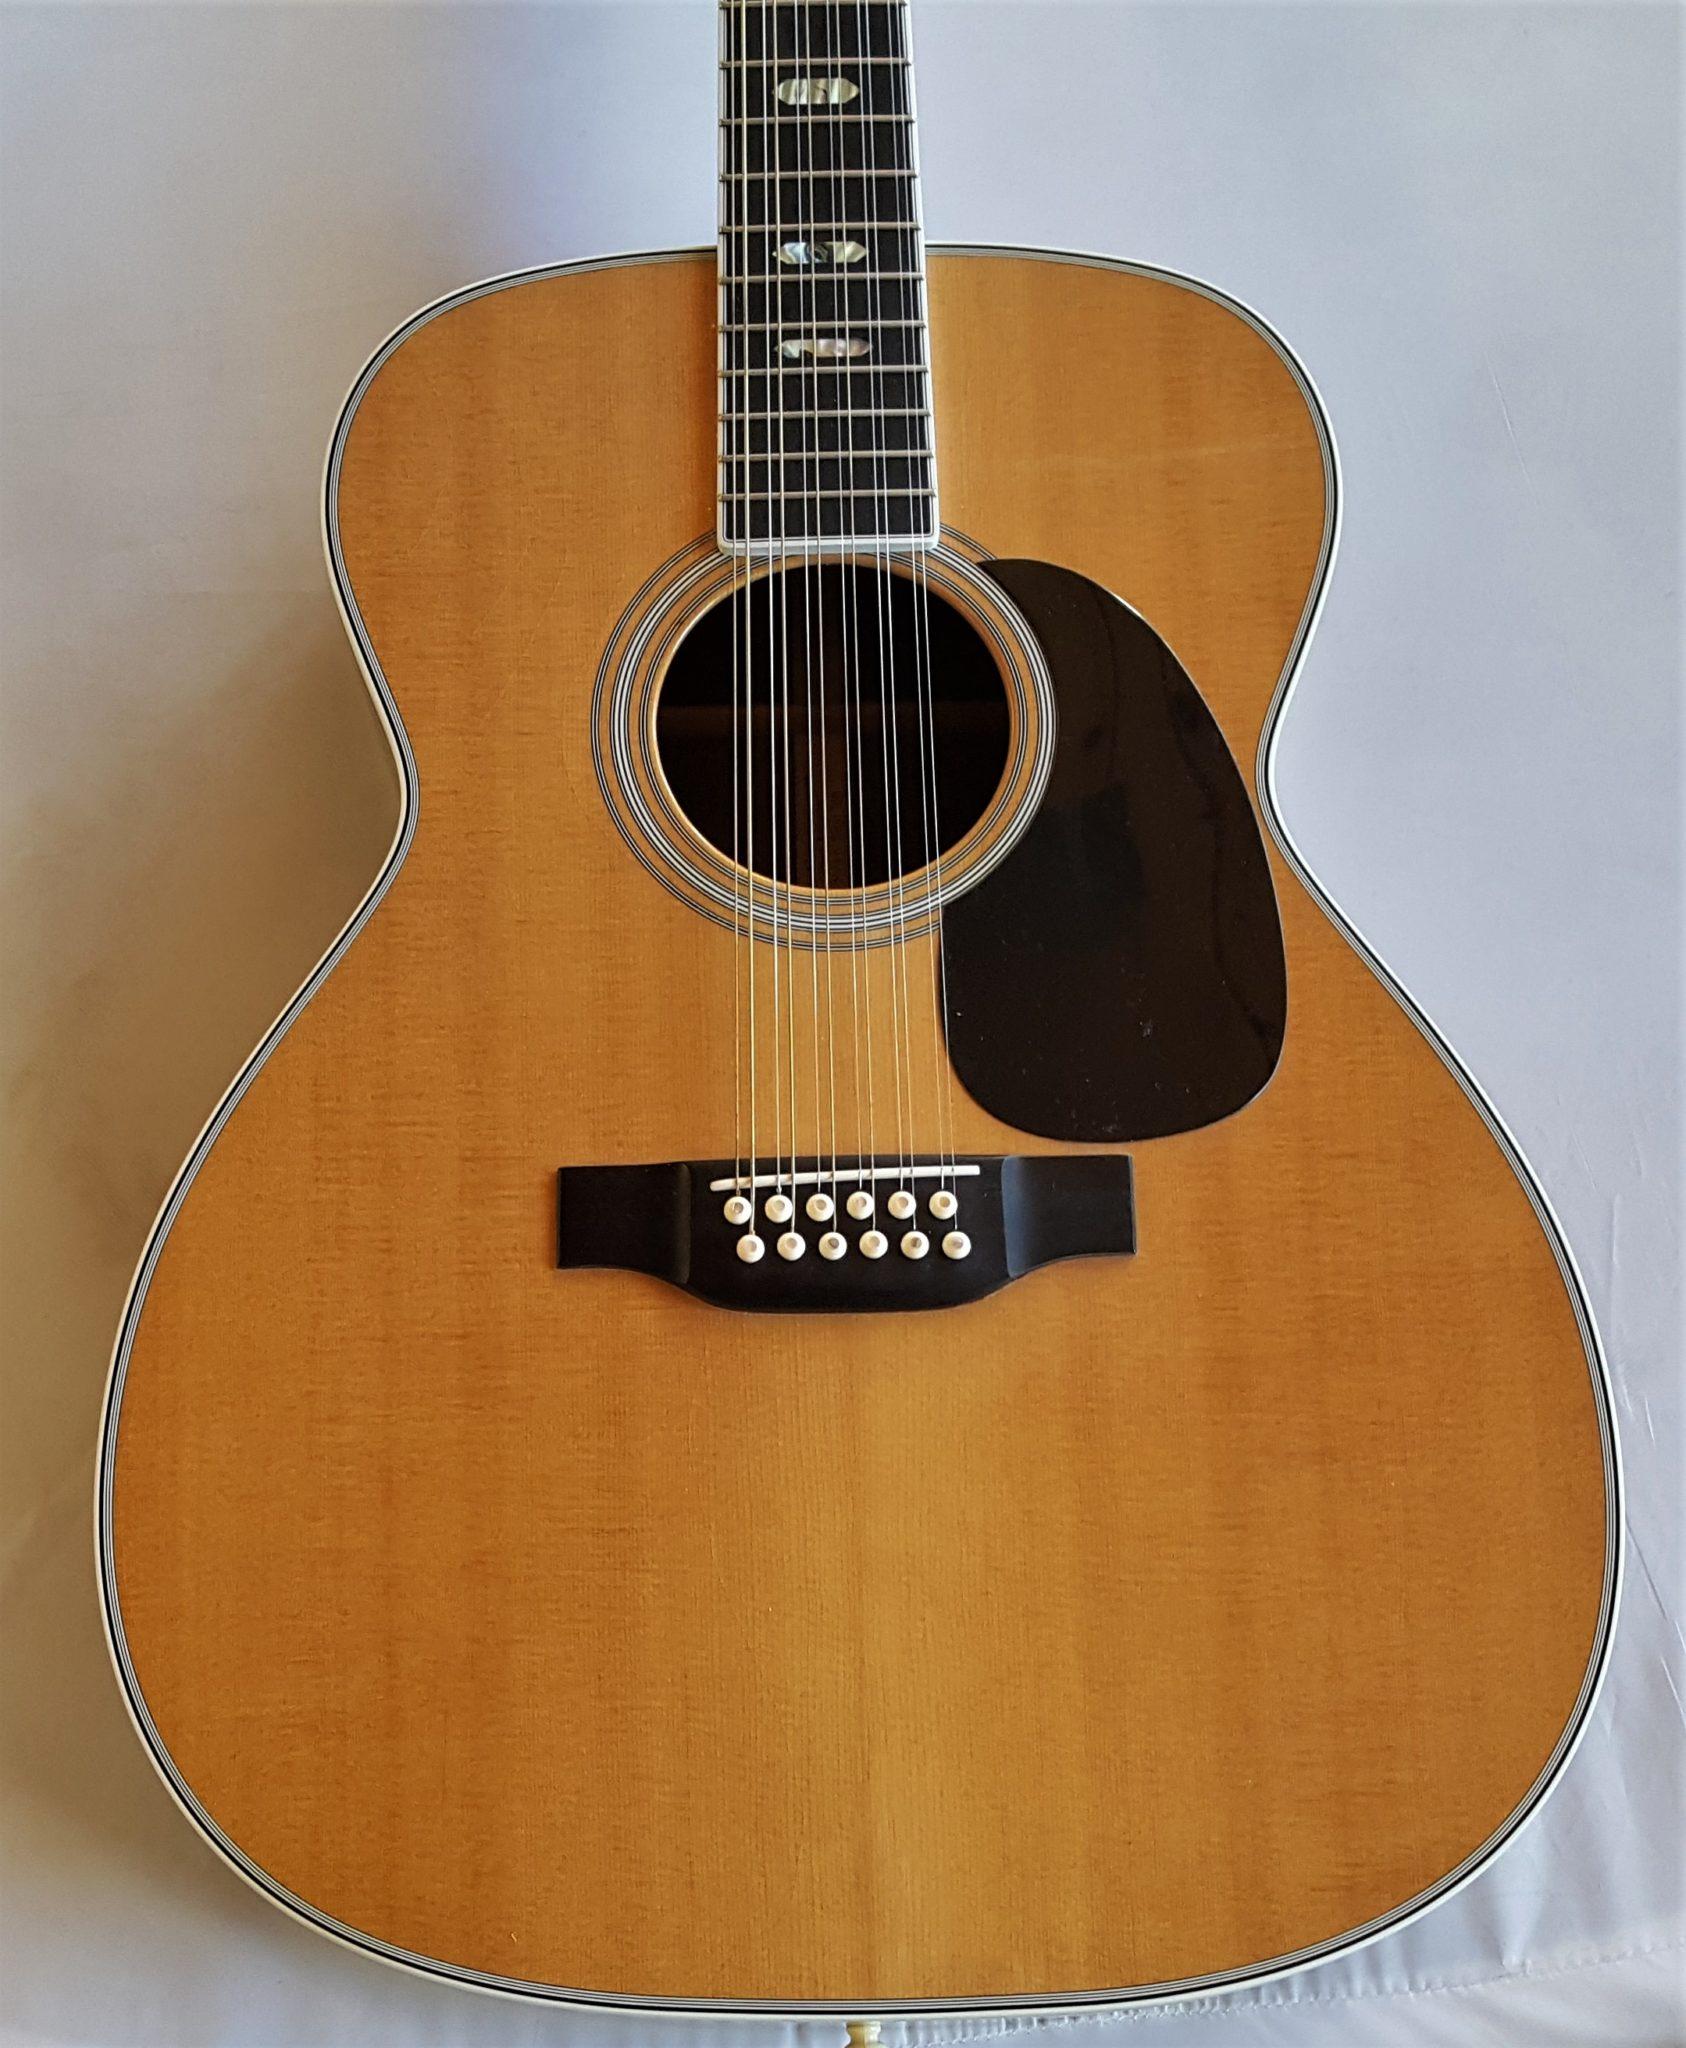 Martin J12 40M Jumbo Acoustic Guitar